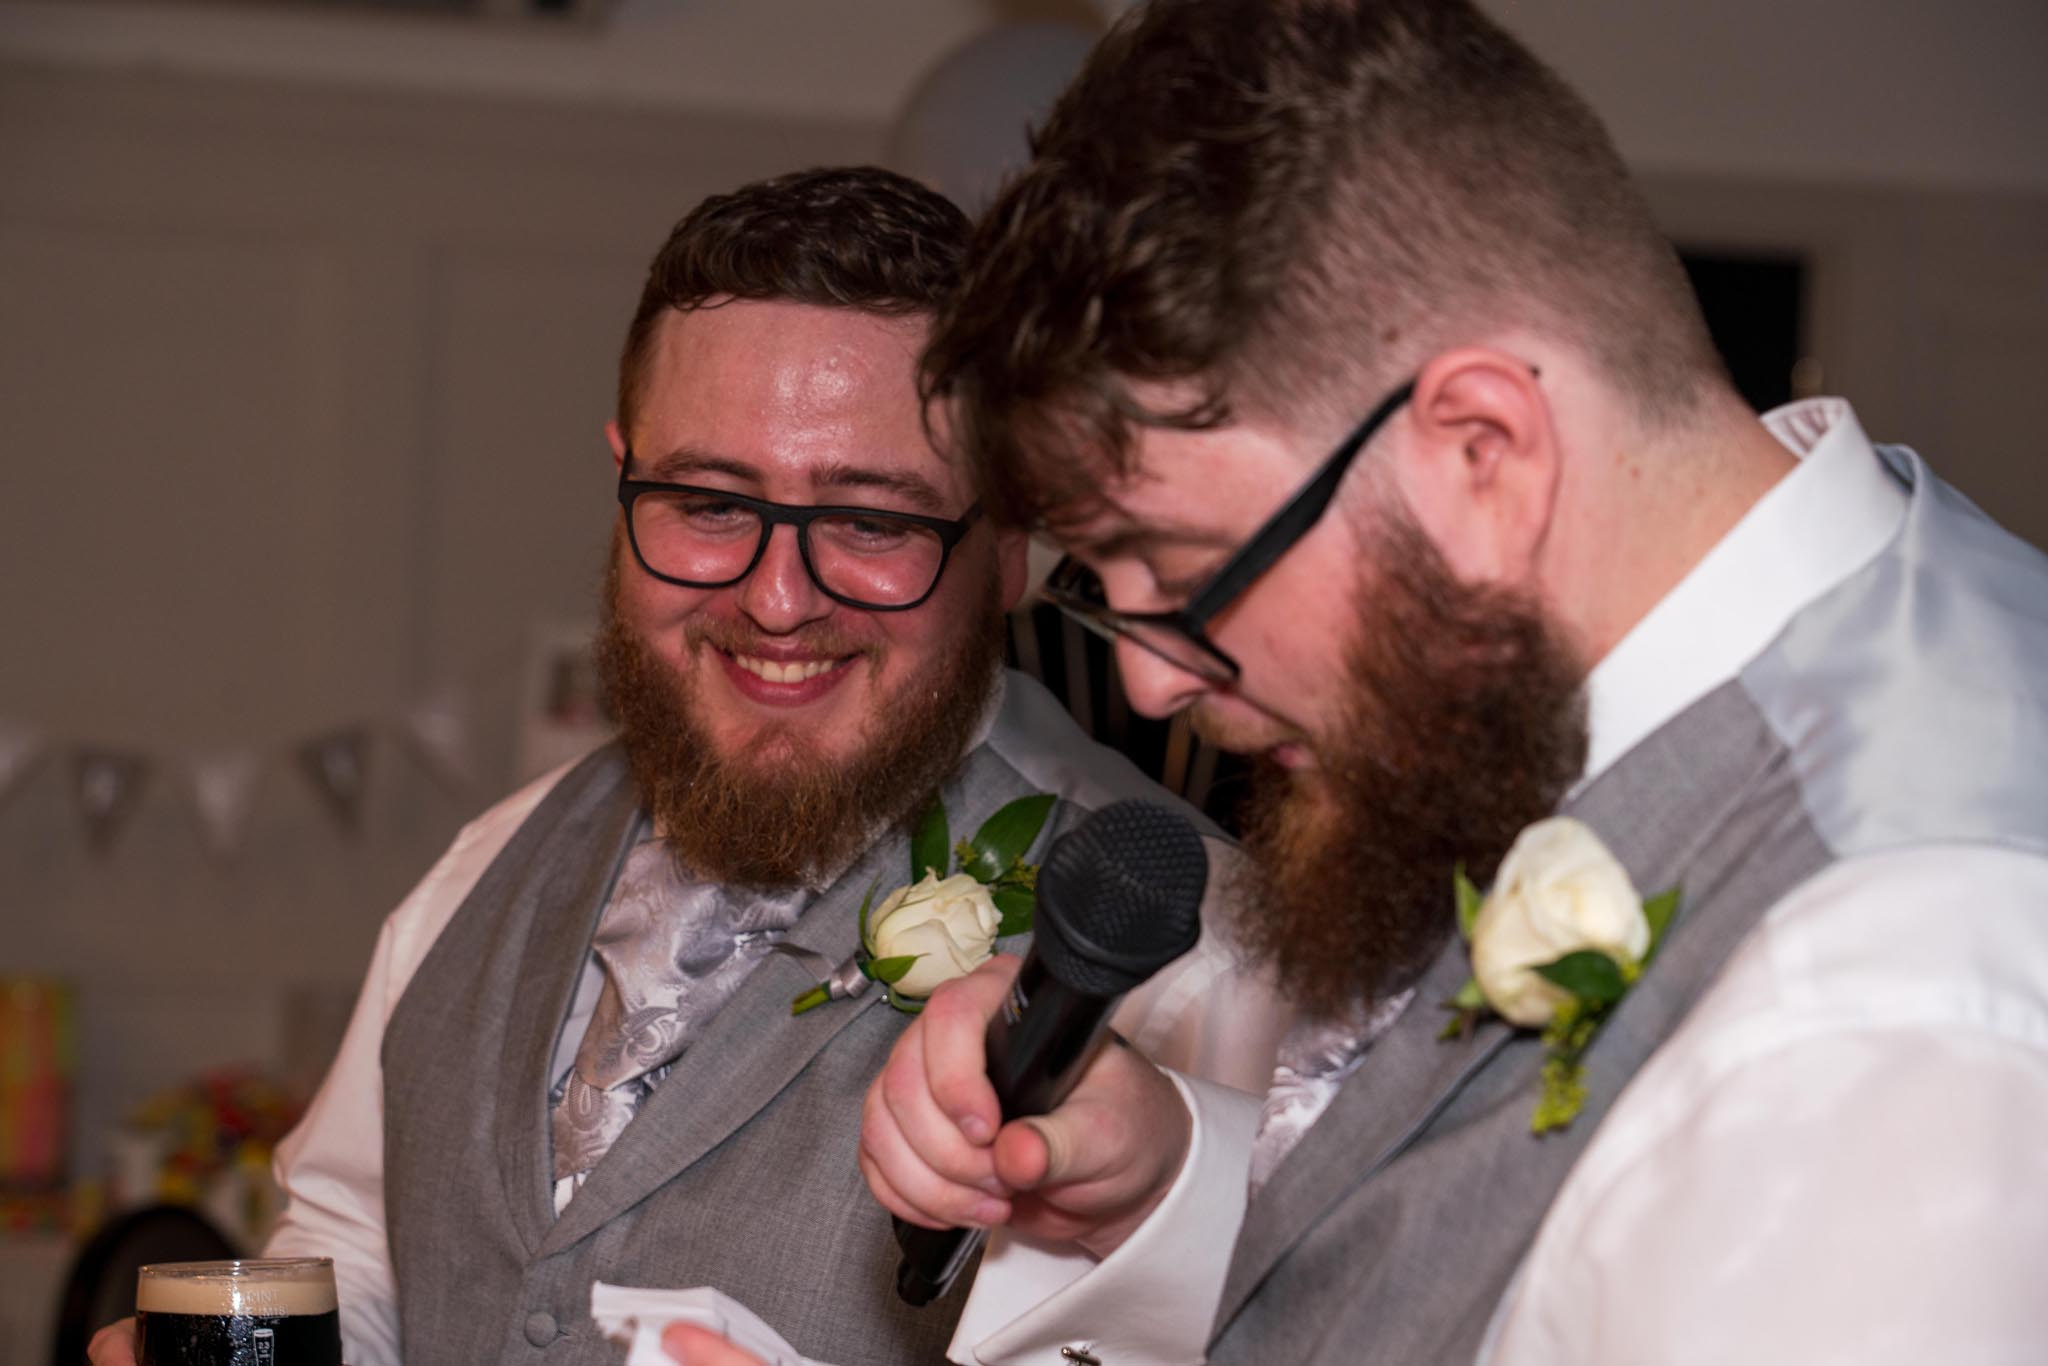 912-Speeches-Luke-Yasmin-The-Rayleigh-Club-Wedding-Photography.jpg